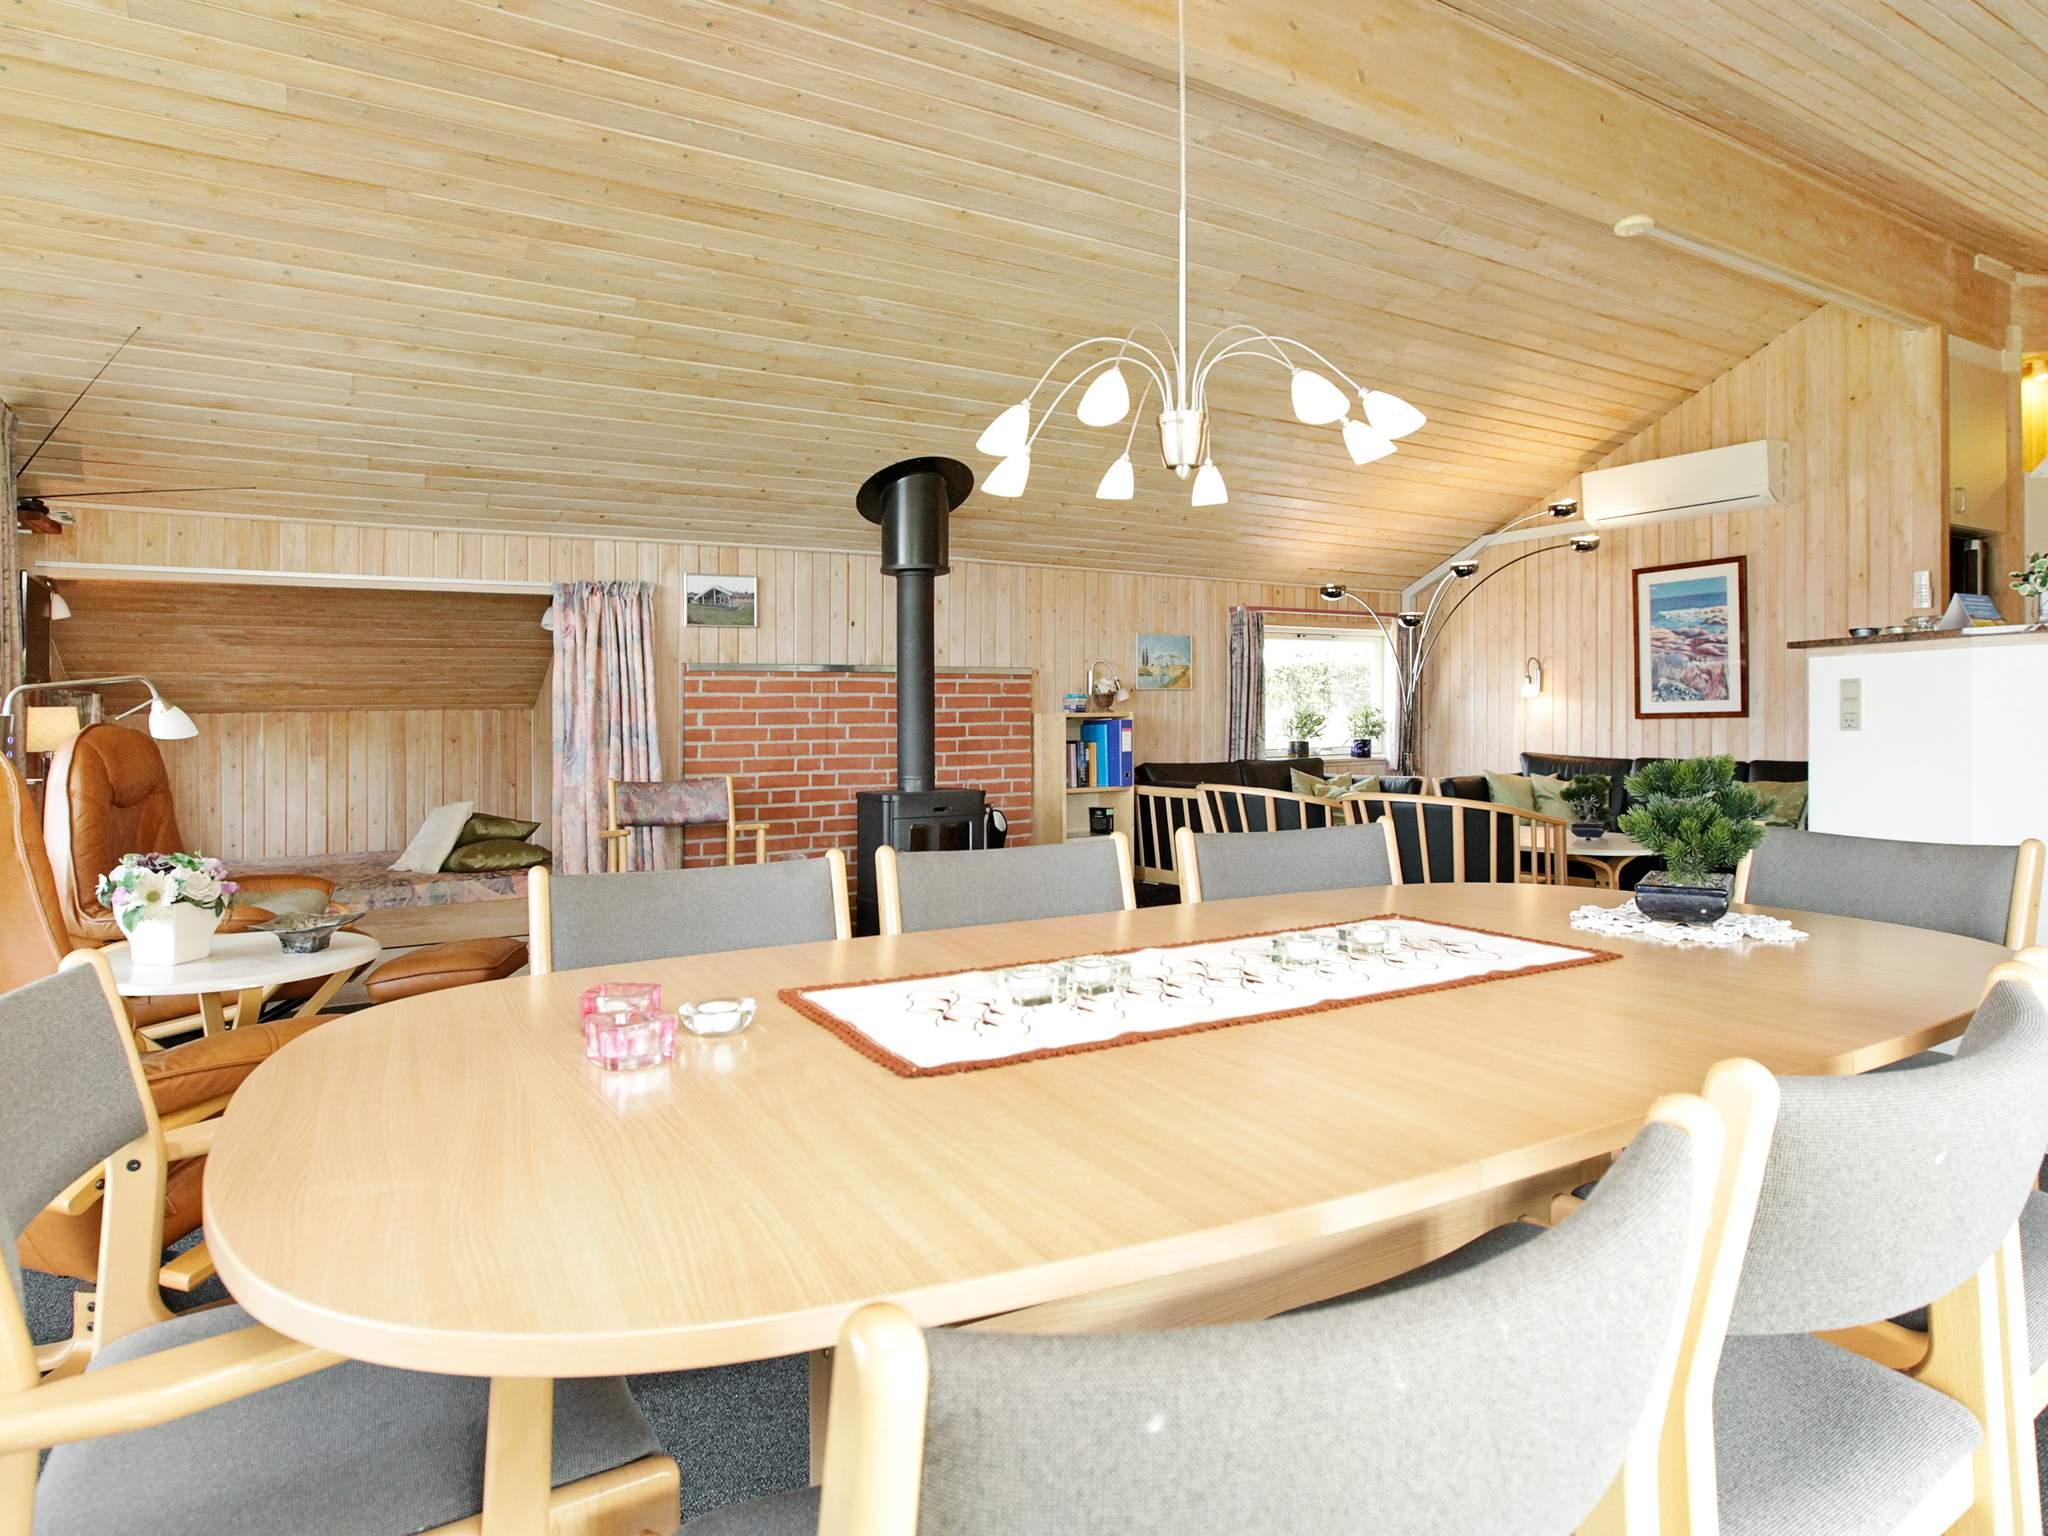 Maison de vacances Falsled (87545), Faldsled, , Fionie, Danemark, image 3